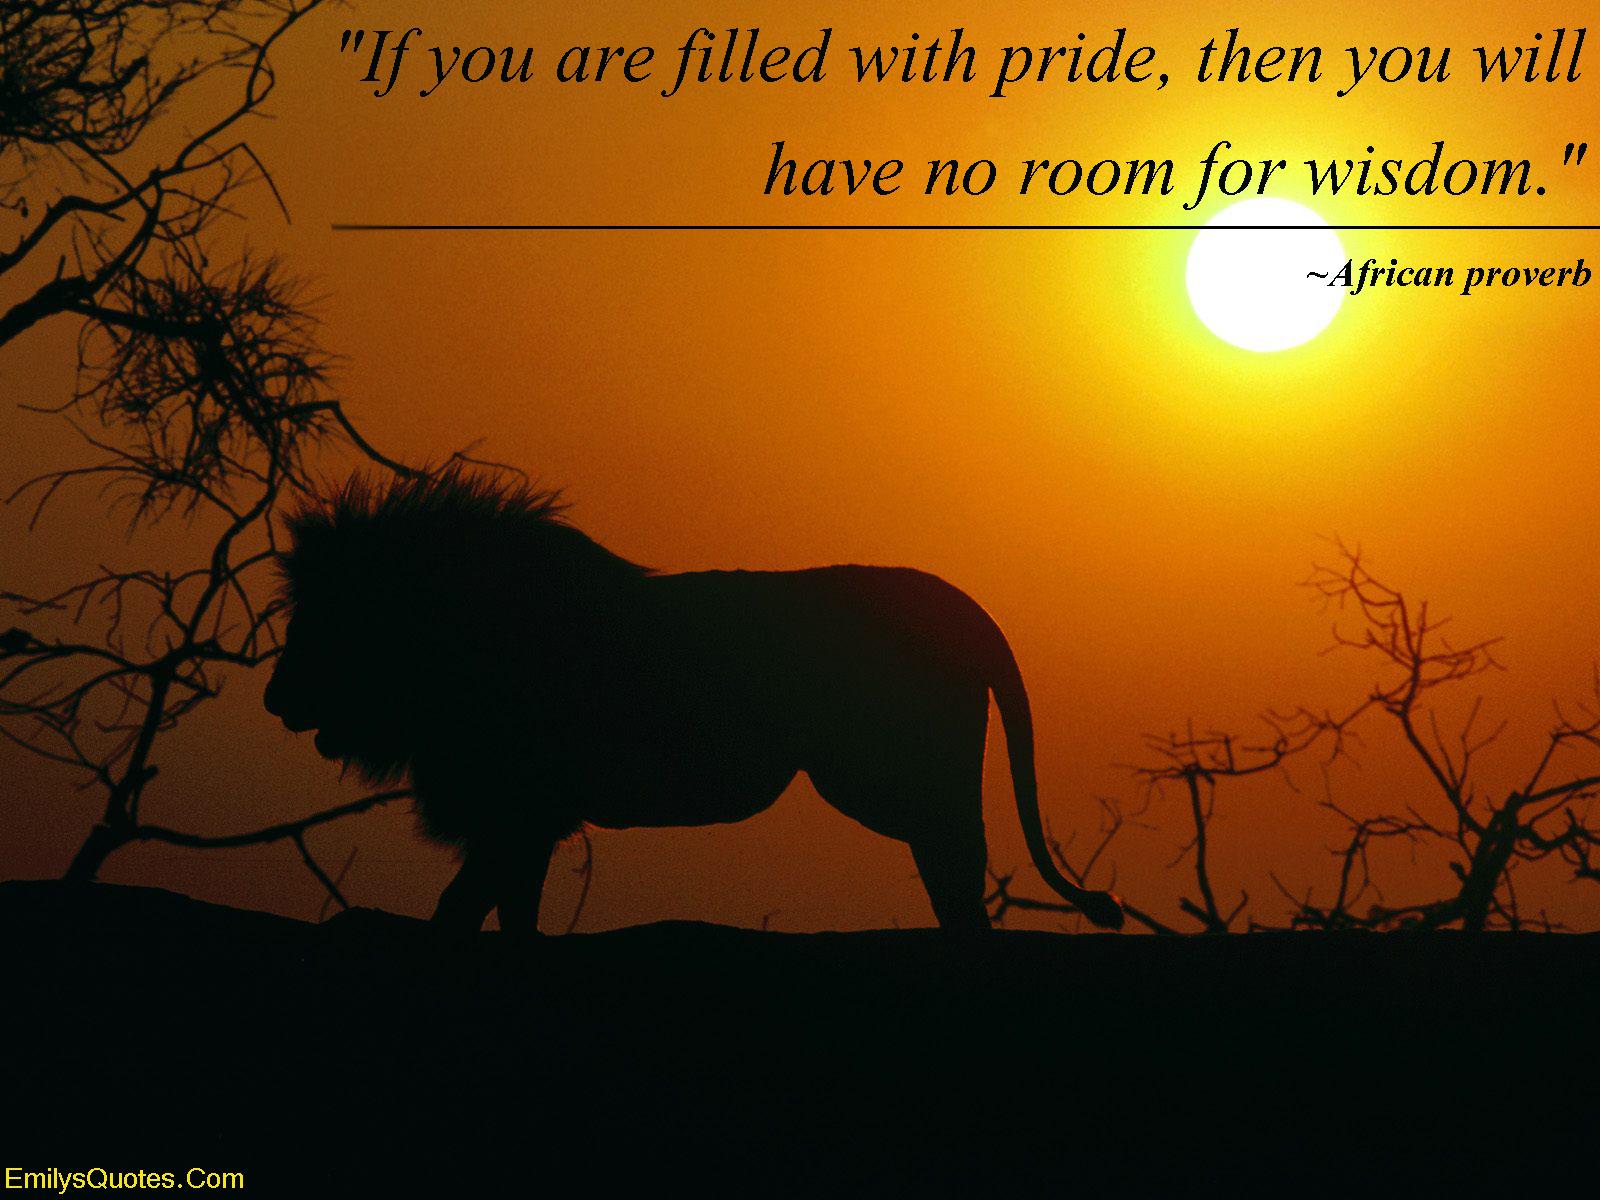 EmilysQuotes.Com - pride, wisdom, intelligence, African proverb, consequences